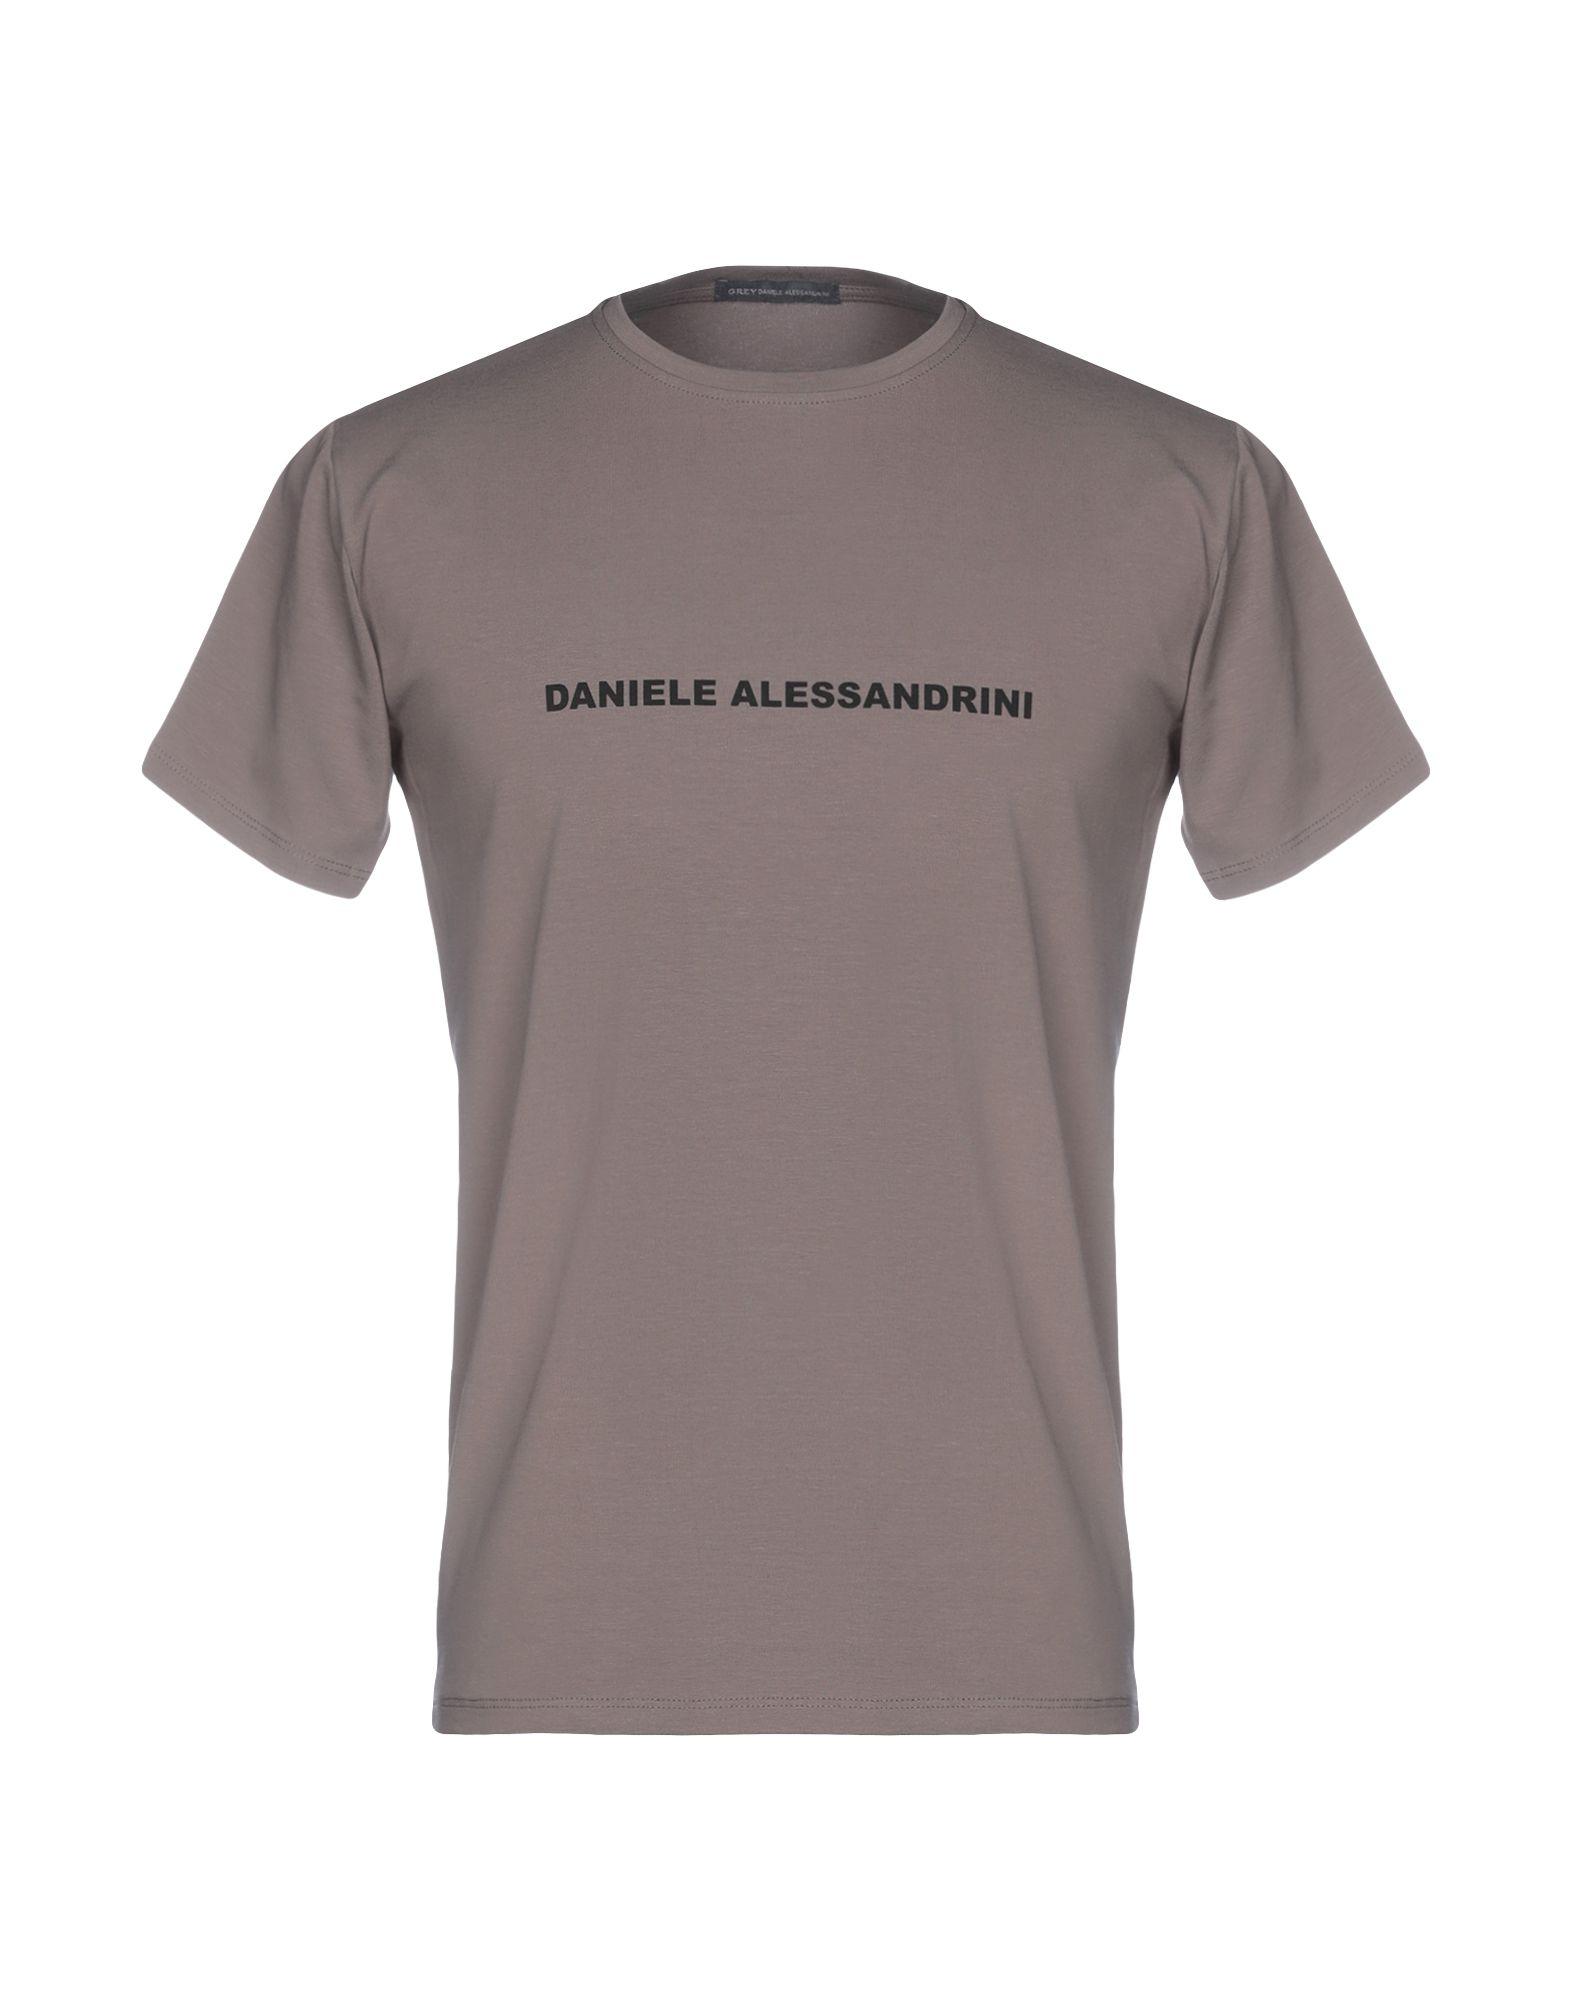 T-Shirt Daniele Alessandrini uomo uomo uomo - 12243343BL 0c2